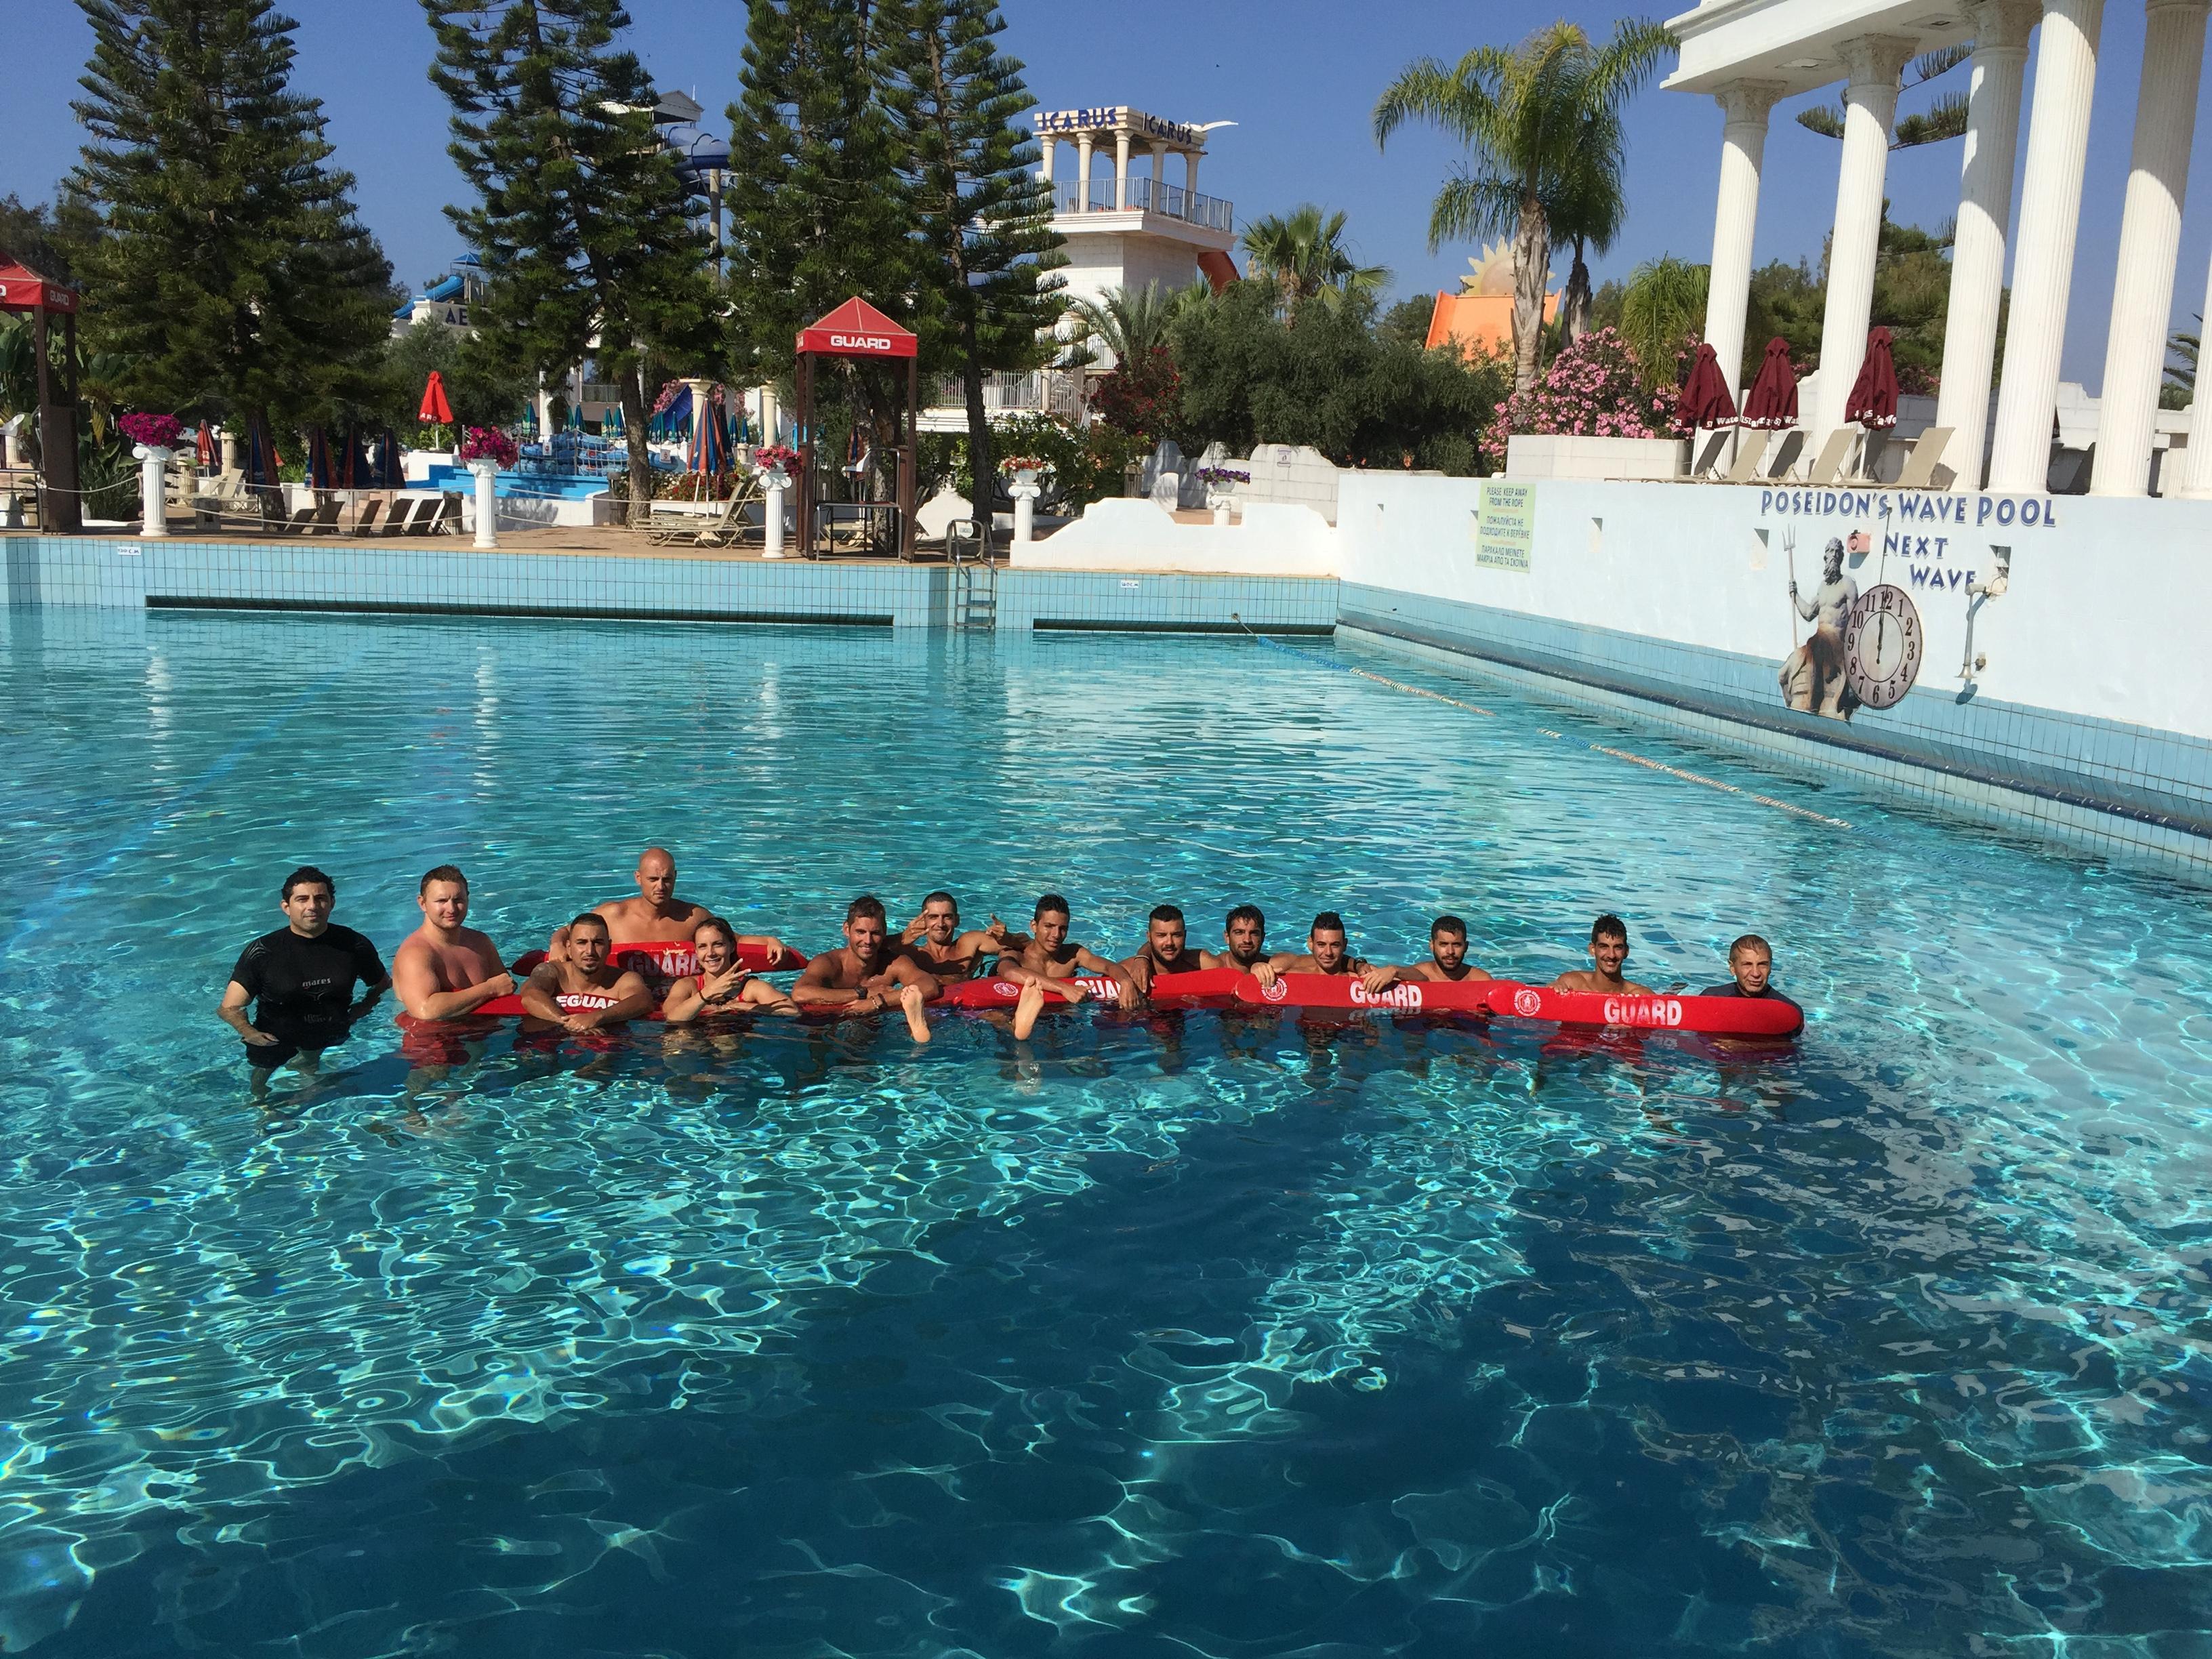 Waterworld Waterpark Group Image Lifeguards